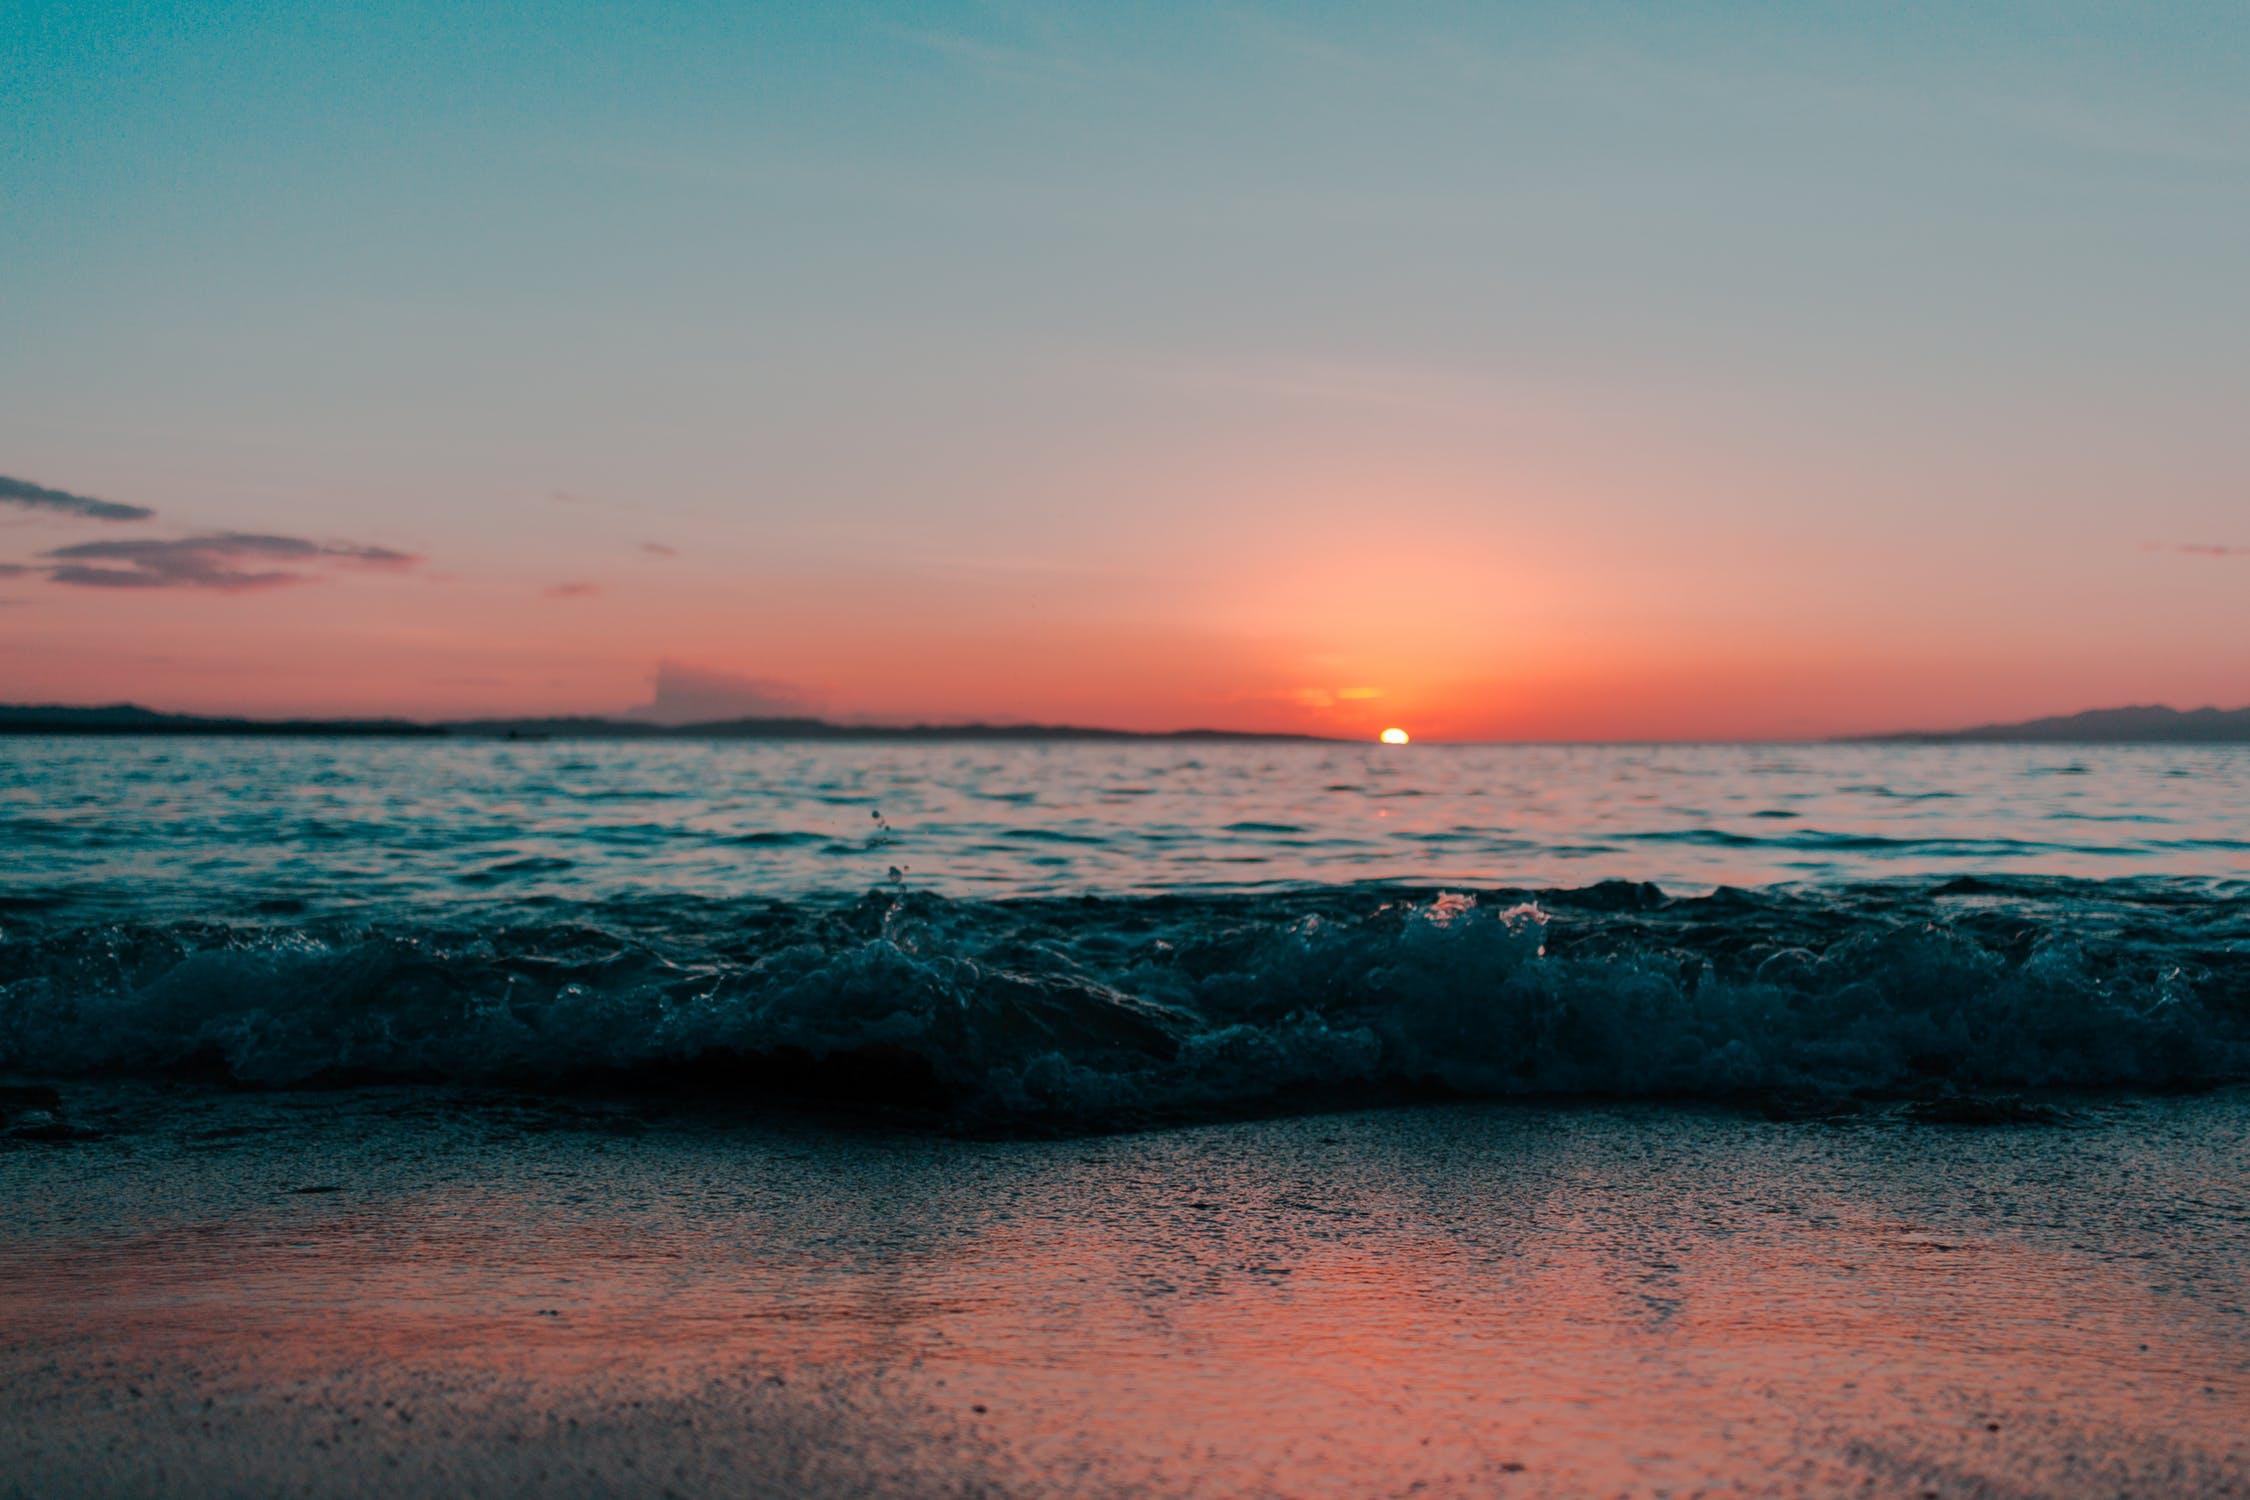 seaside = ชายทะเล, ชายหาด